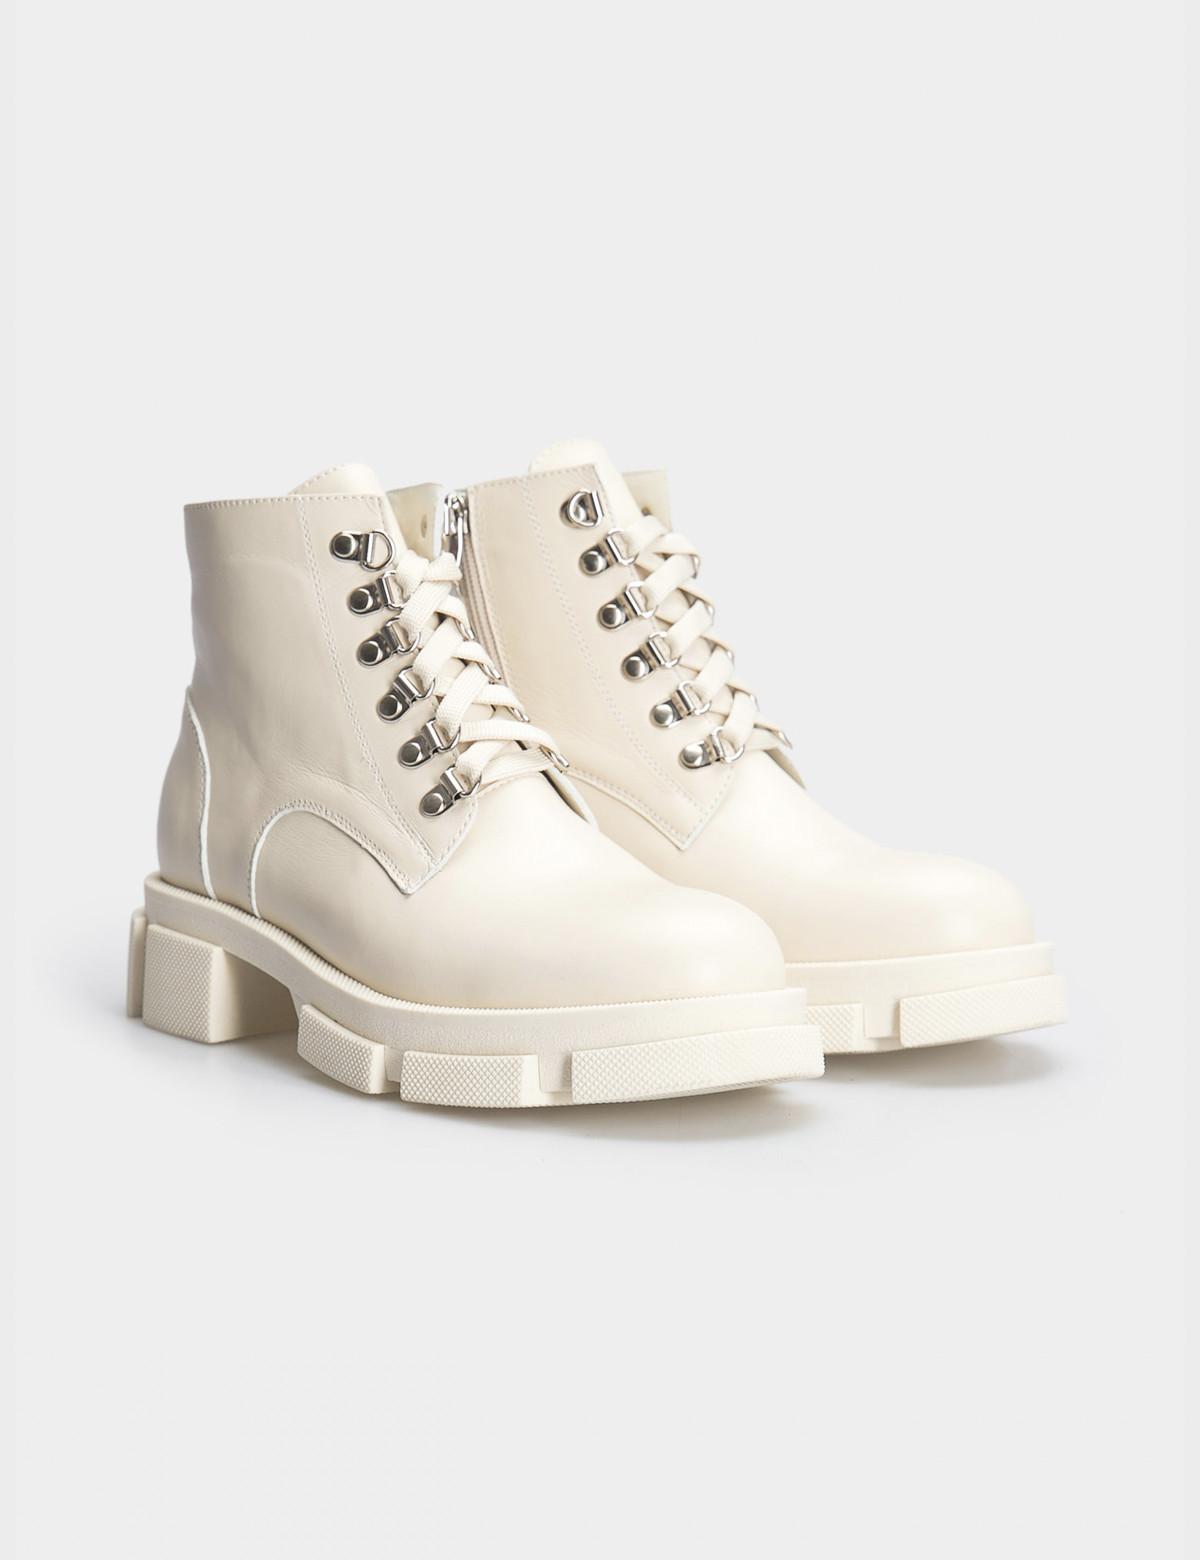 Ботинки бежевые. Натуральная кожа. Байка1